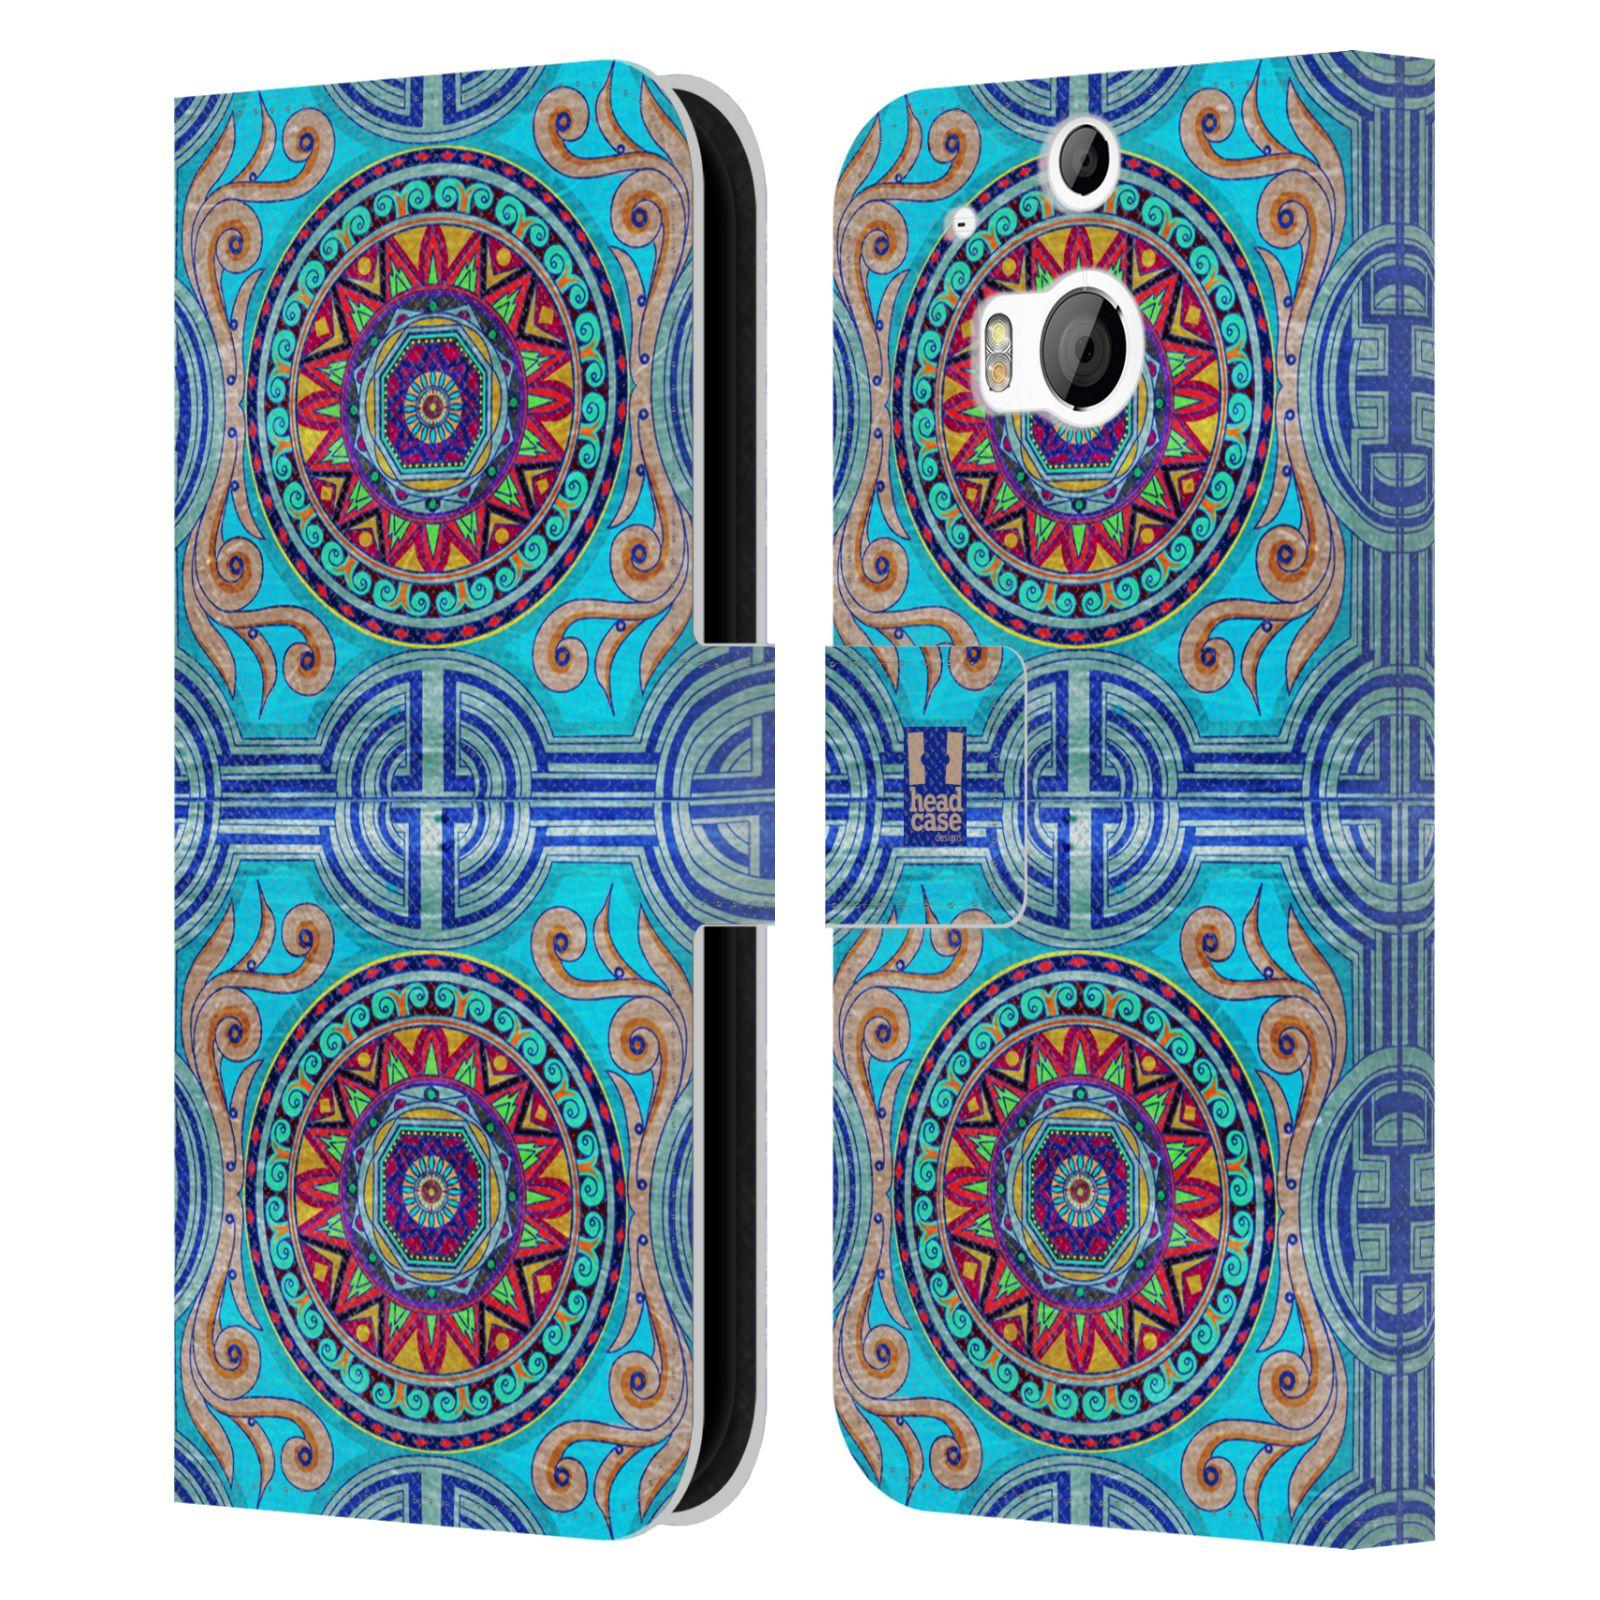 HEAD CASE Flipové pouzdro pro mobil HTC ONE (M8, M8s) ARABESKA modrá